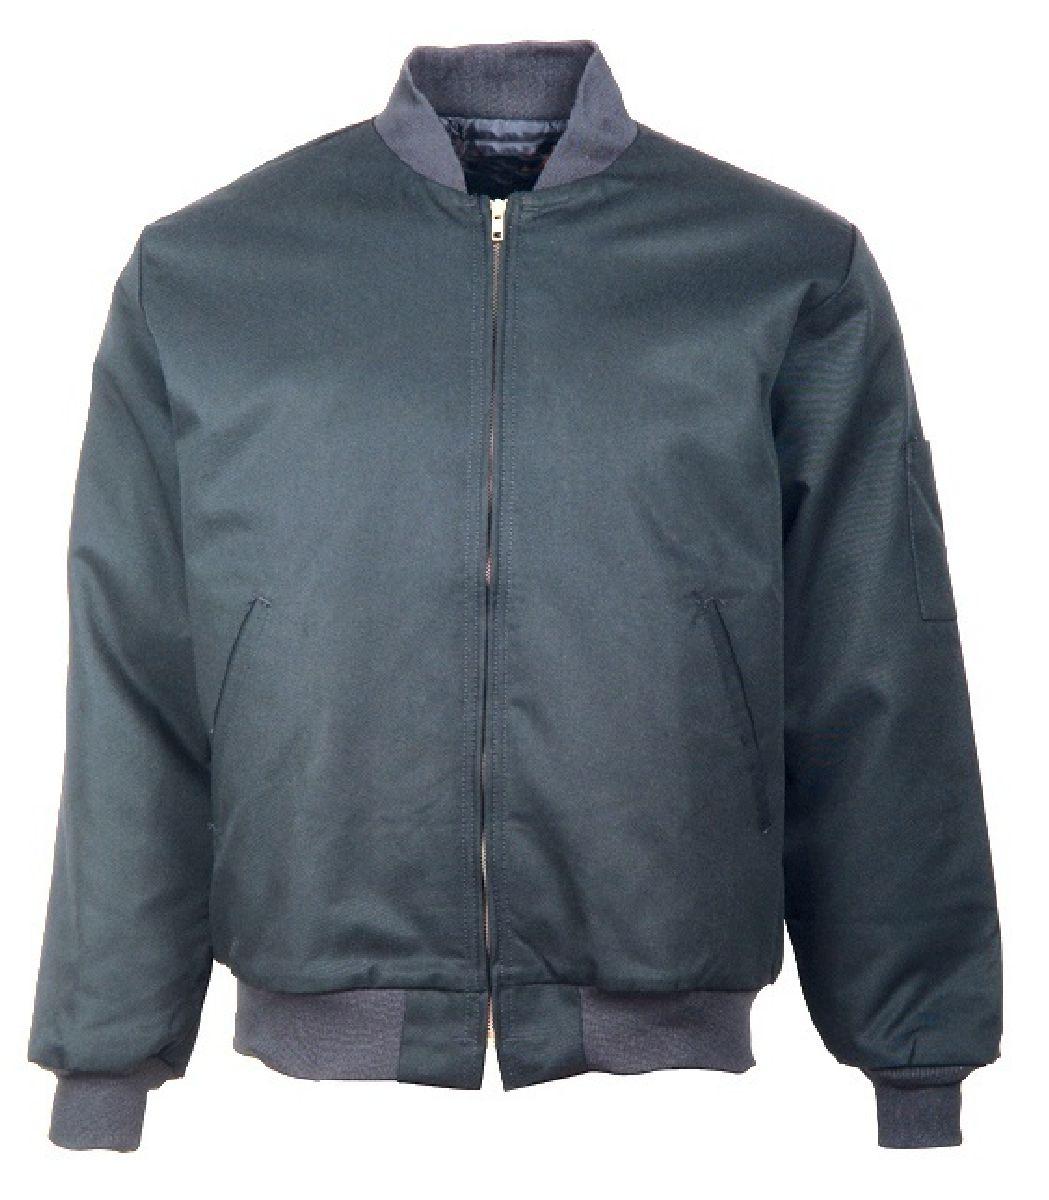 Industrial Work Jackets